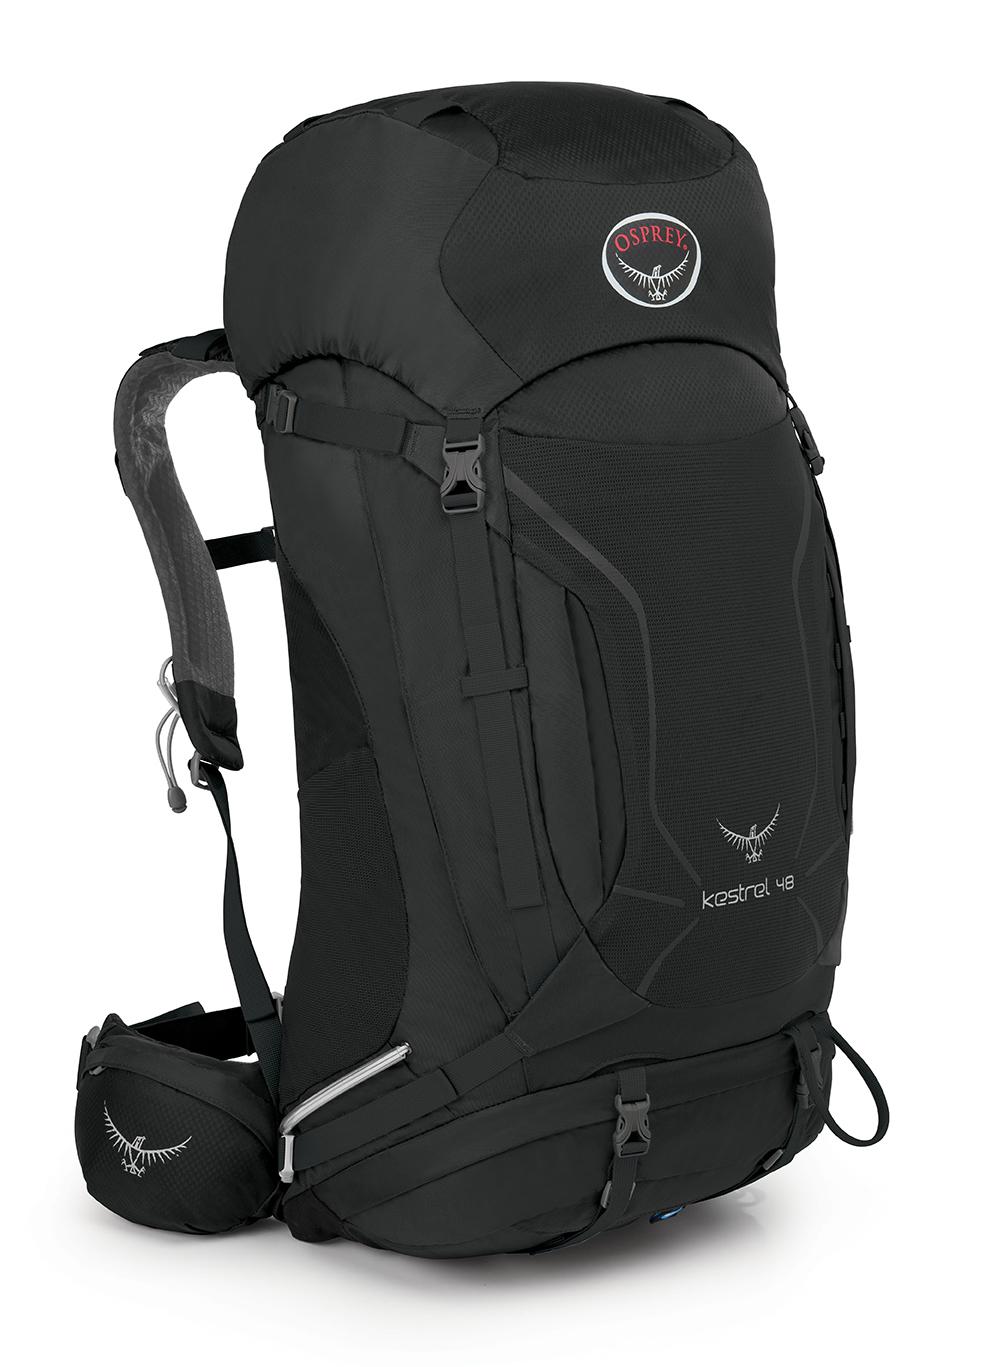 Osprey Kestrel 48 - Trekkingrucksack - Herren